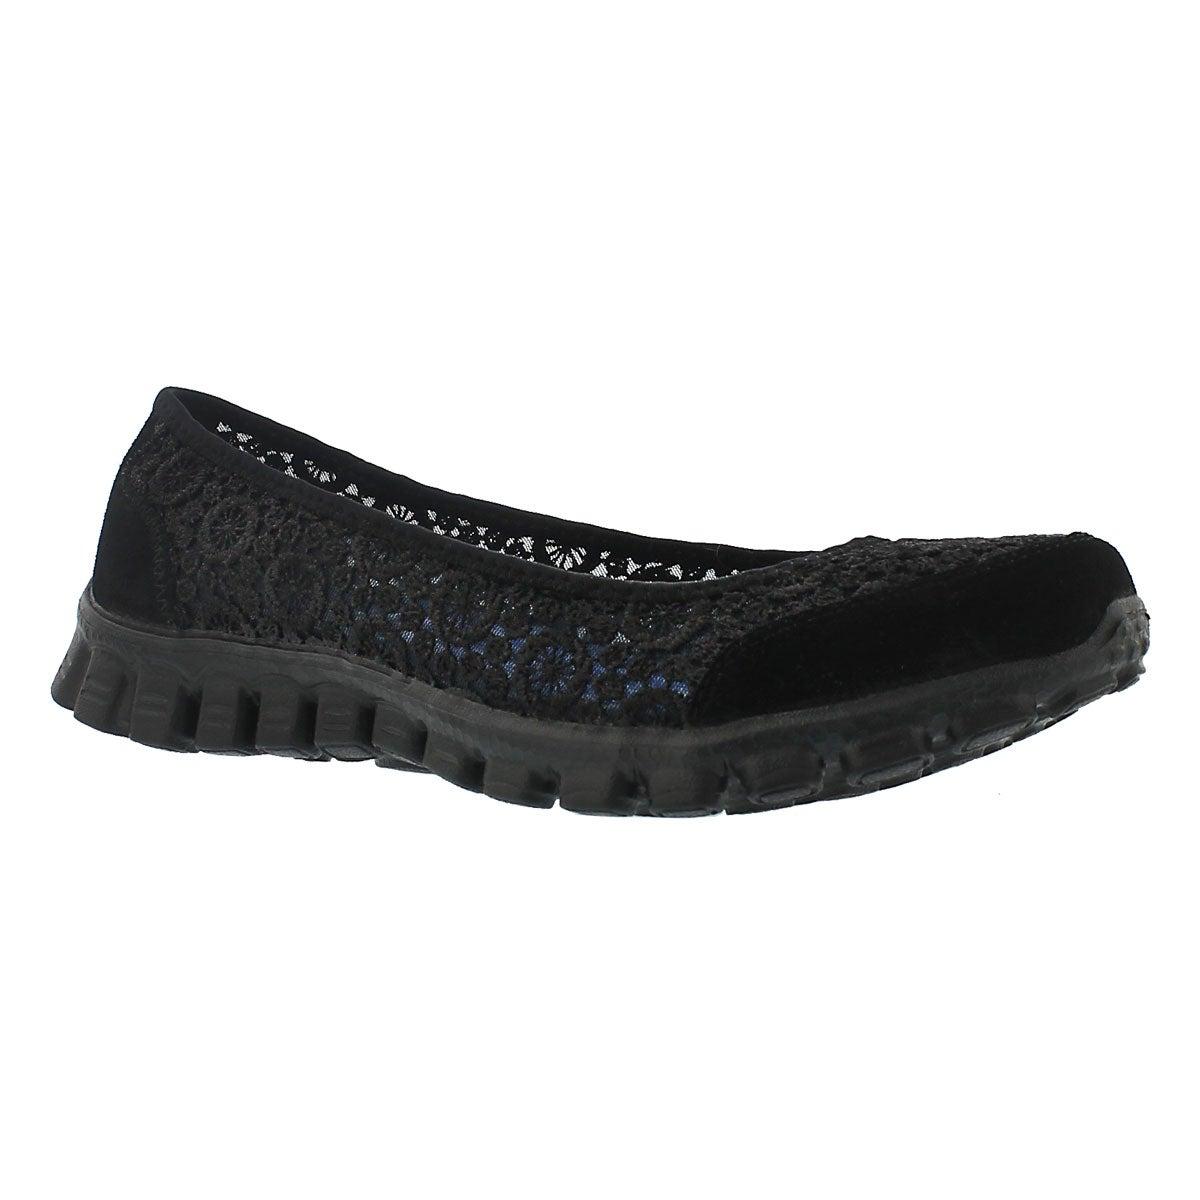 Lds Flighty black crochet skimmer